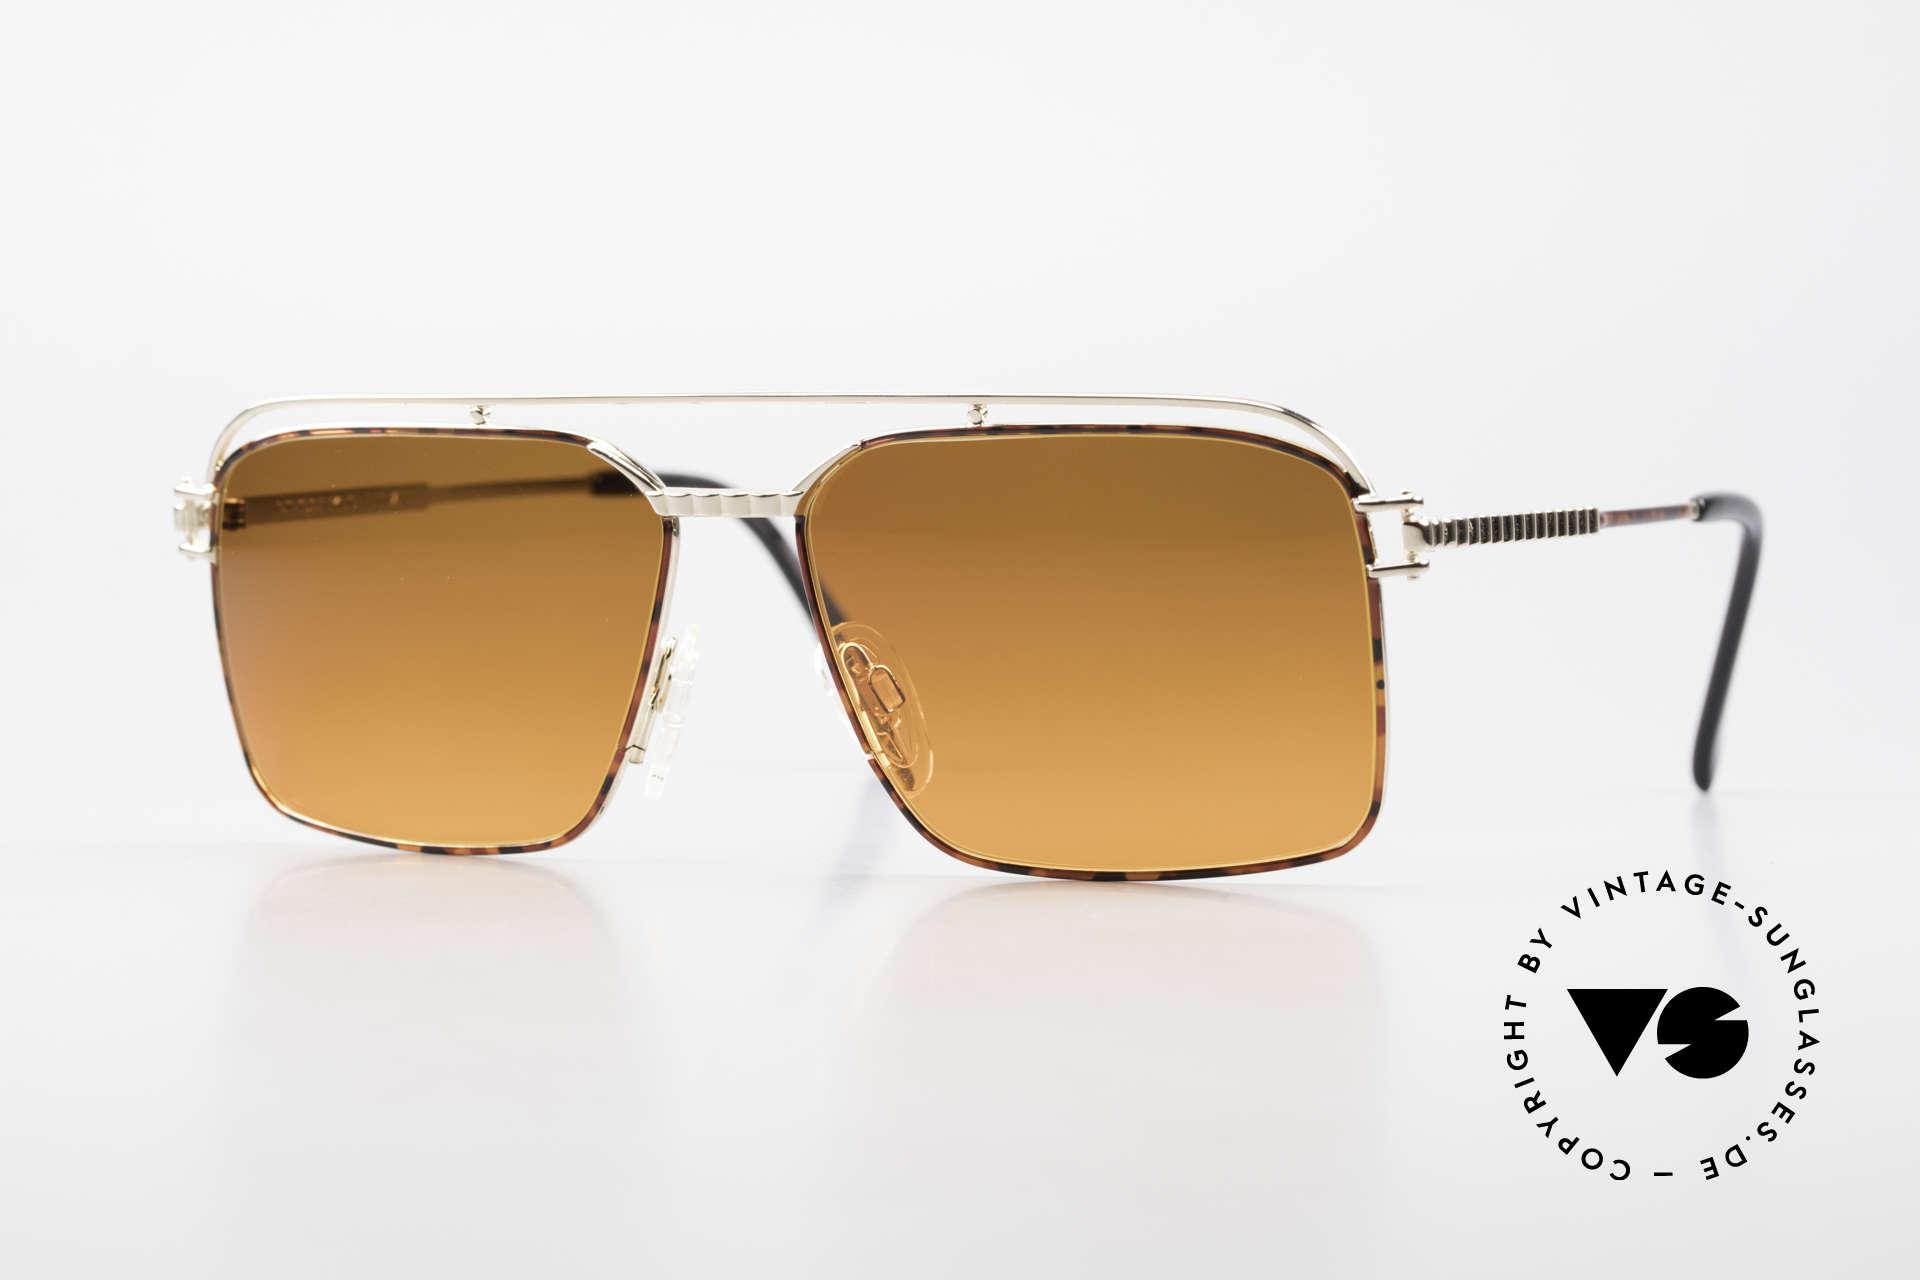 Neostyle Dynasty 424 - L 80er Herrensonnenbrille Titan, Neostyle Dynasty 424, Gr. 58/16 Sonnenbrille, Passend für Herren